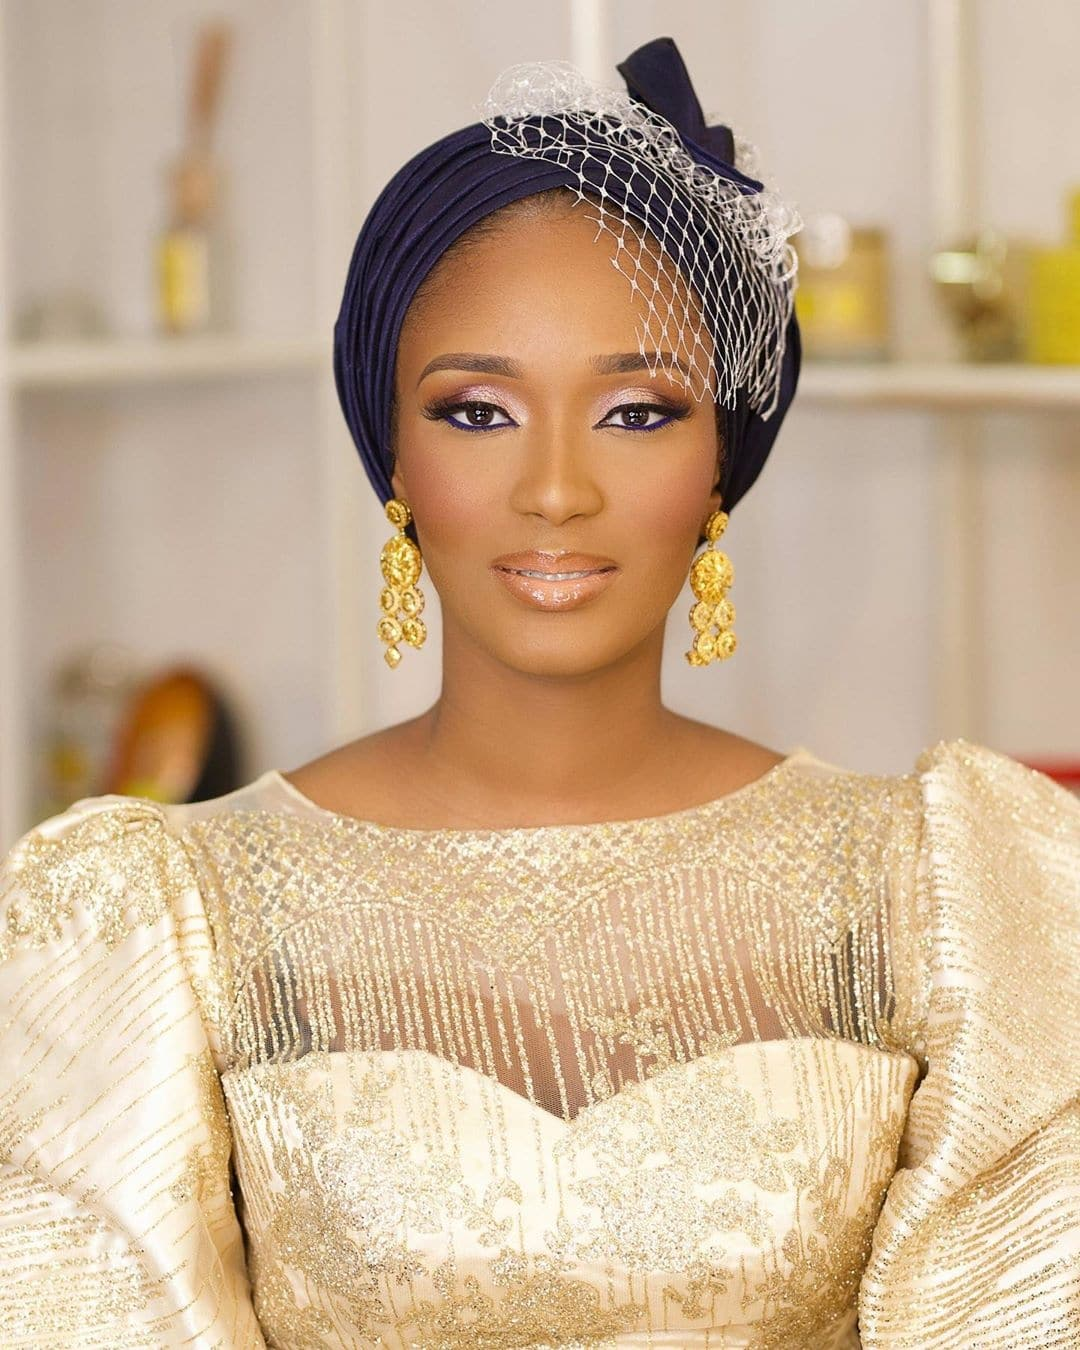 meet-titilayo-yussuff-of-hermosaa-as-she-beautifies-african-women